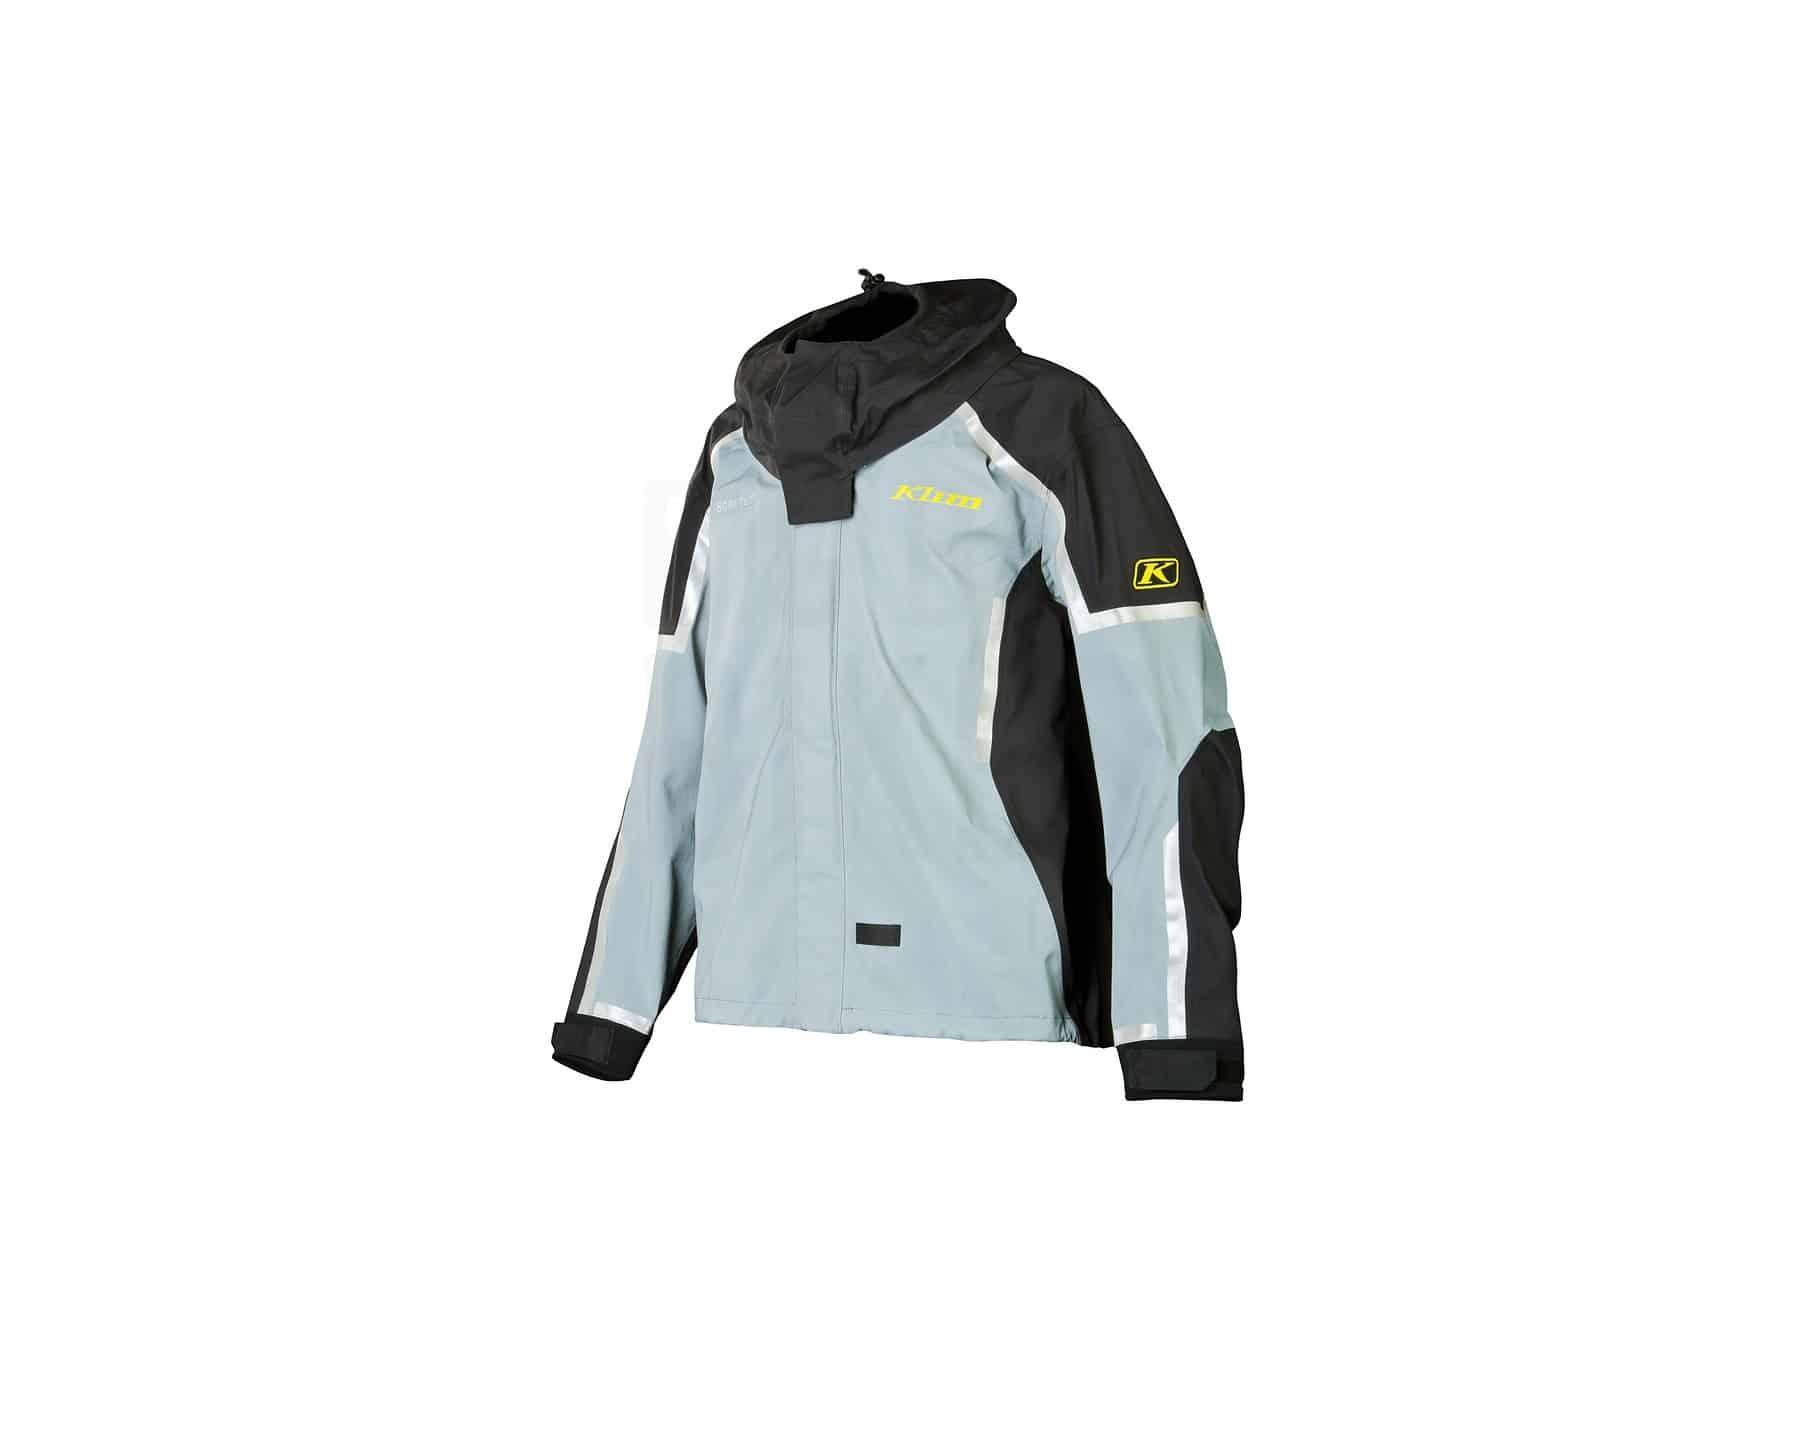 F Goretex Overshell Jacket 5057-000-000-D1